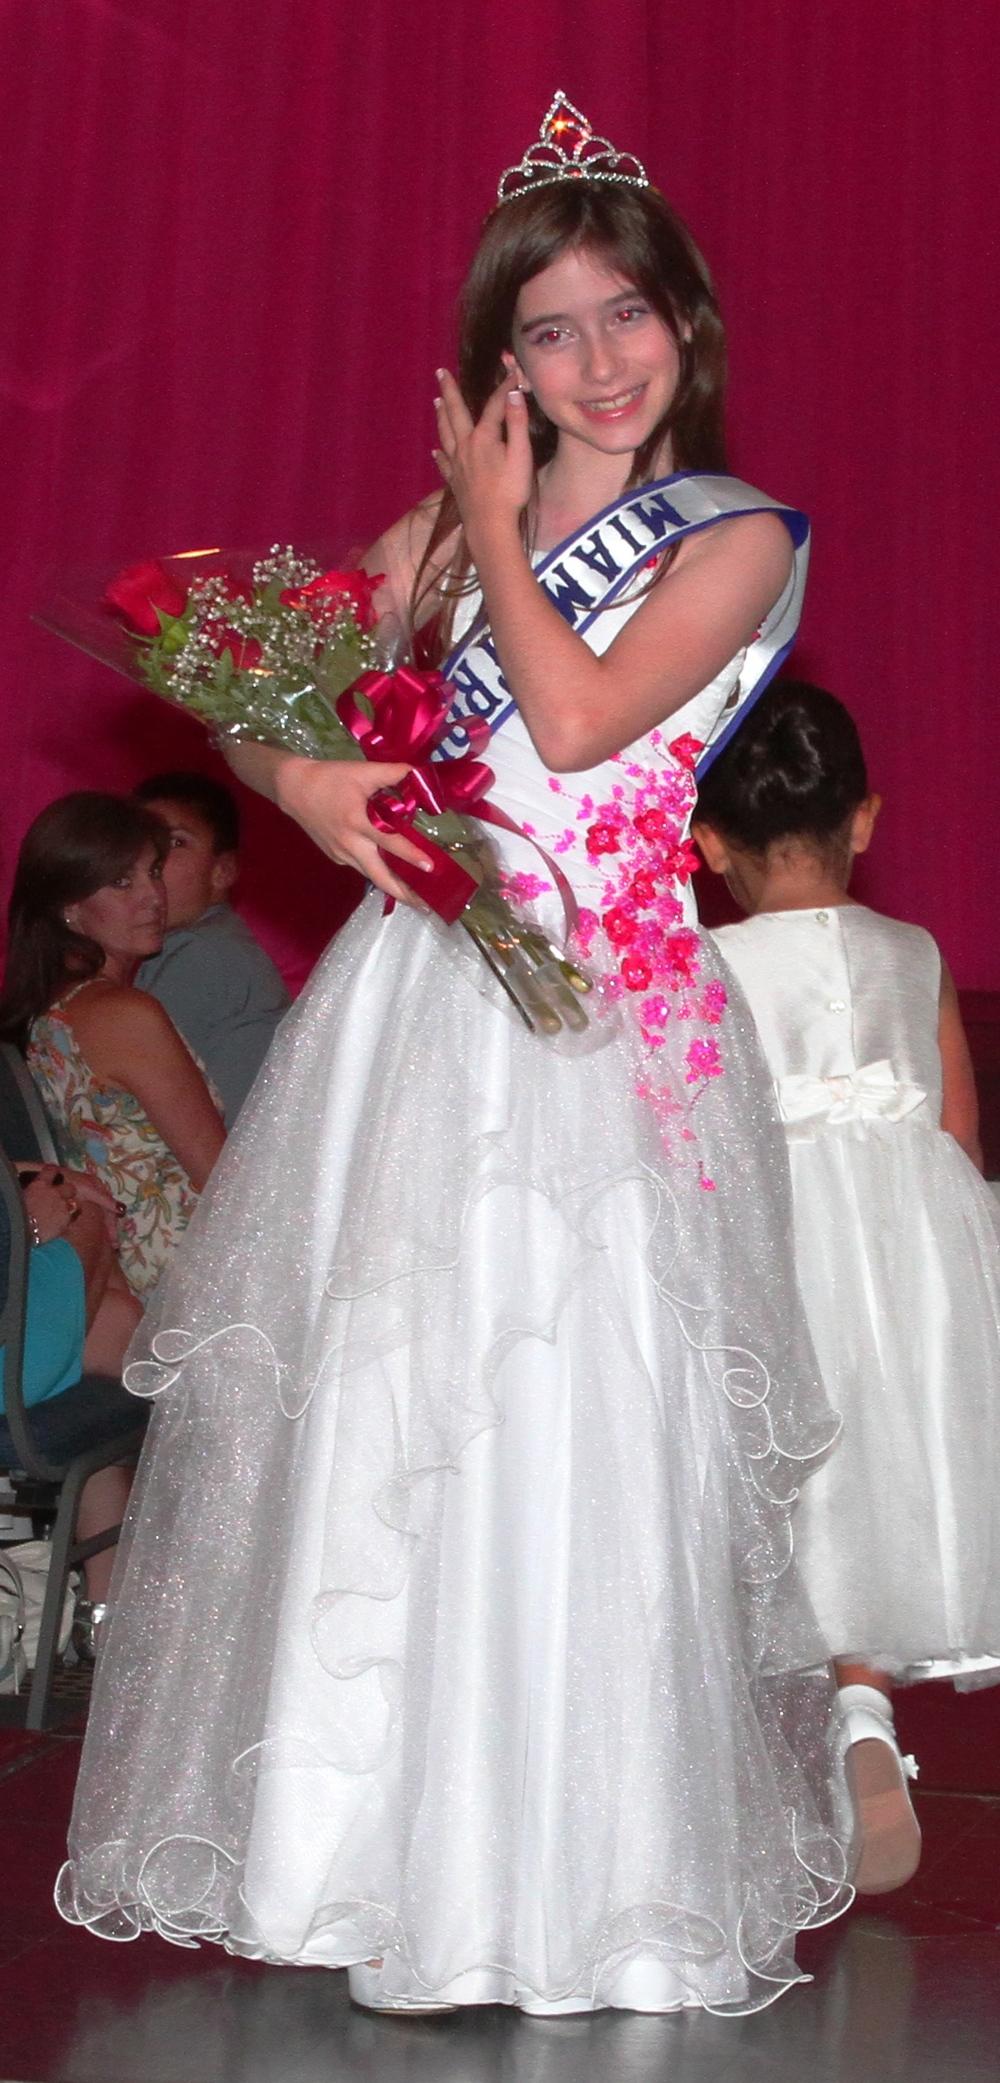 Paulina Tein miss Miami Tropic Princess 2013